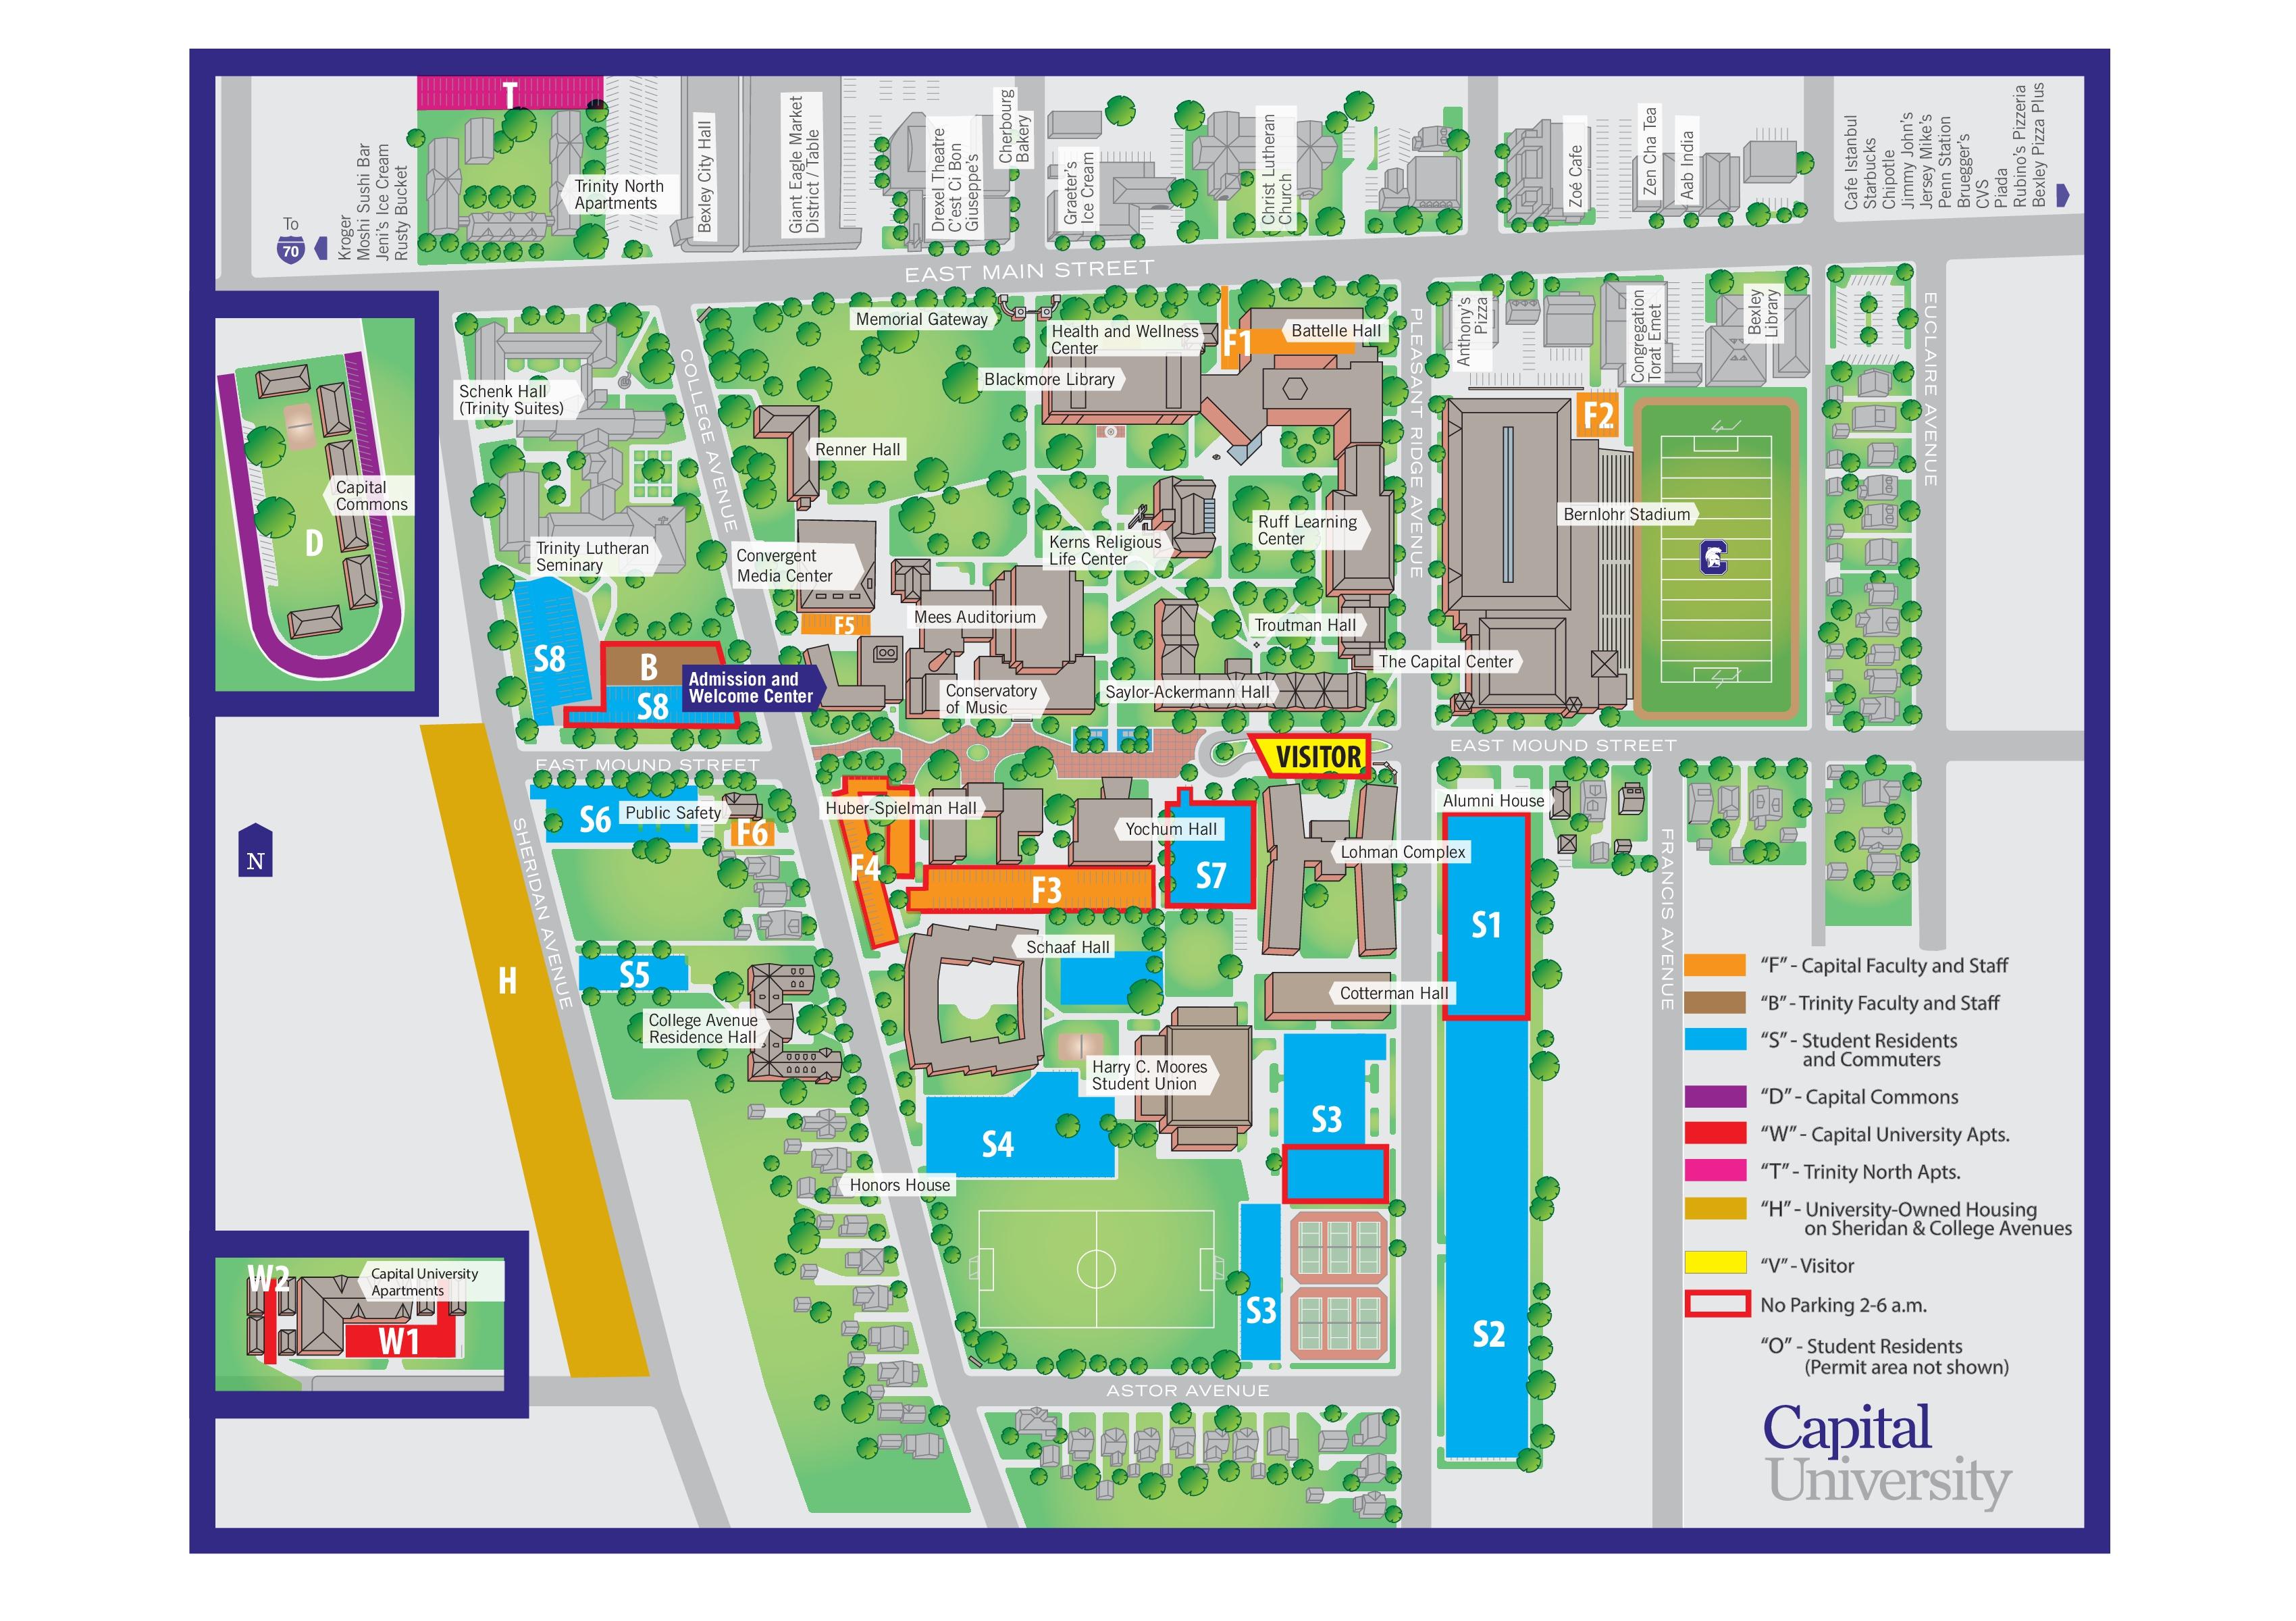 Dayton Area Map | Dayton Directions & Maps